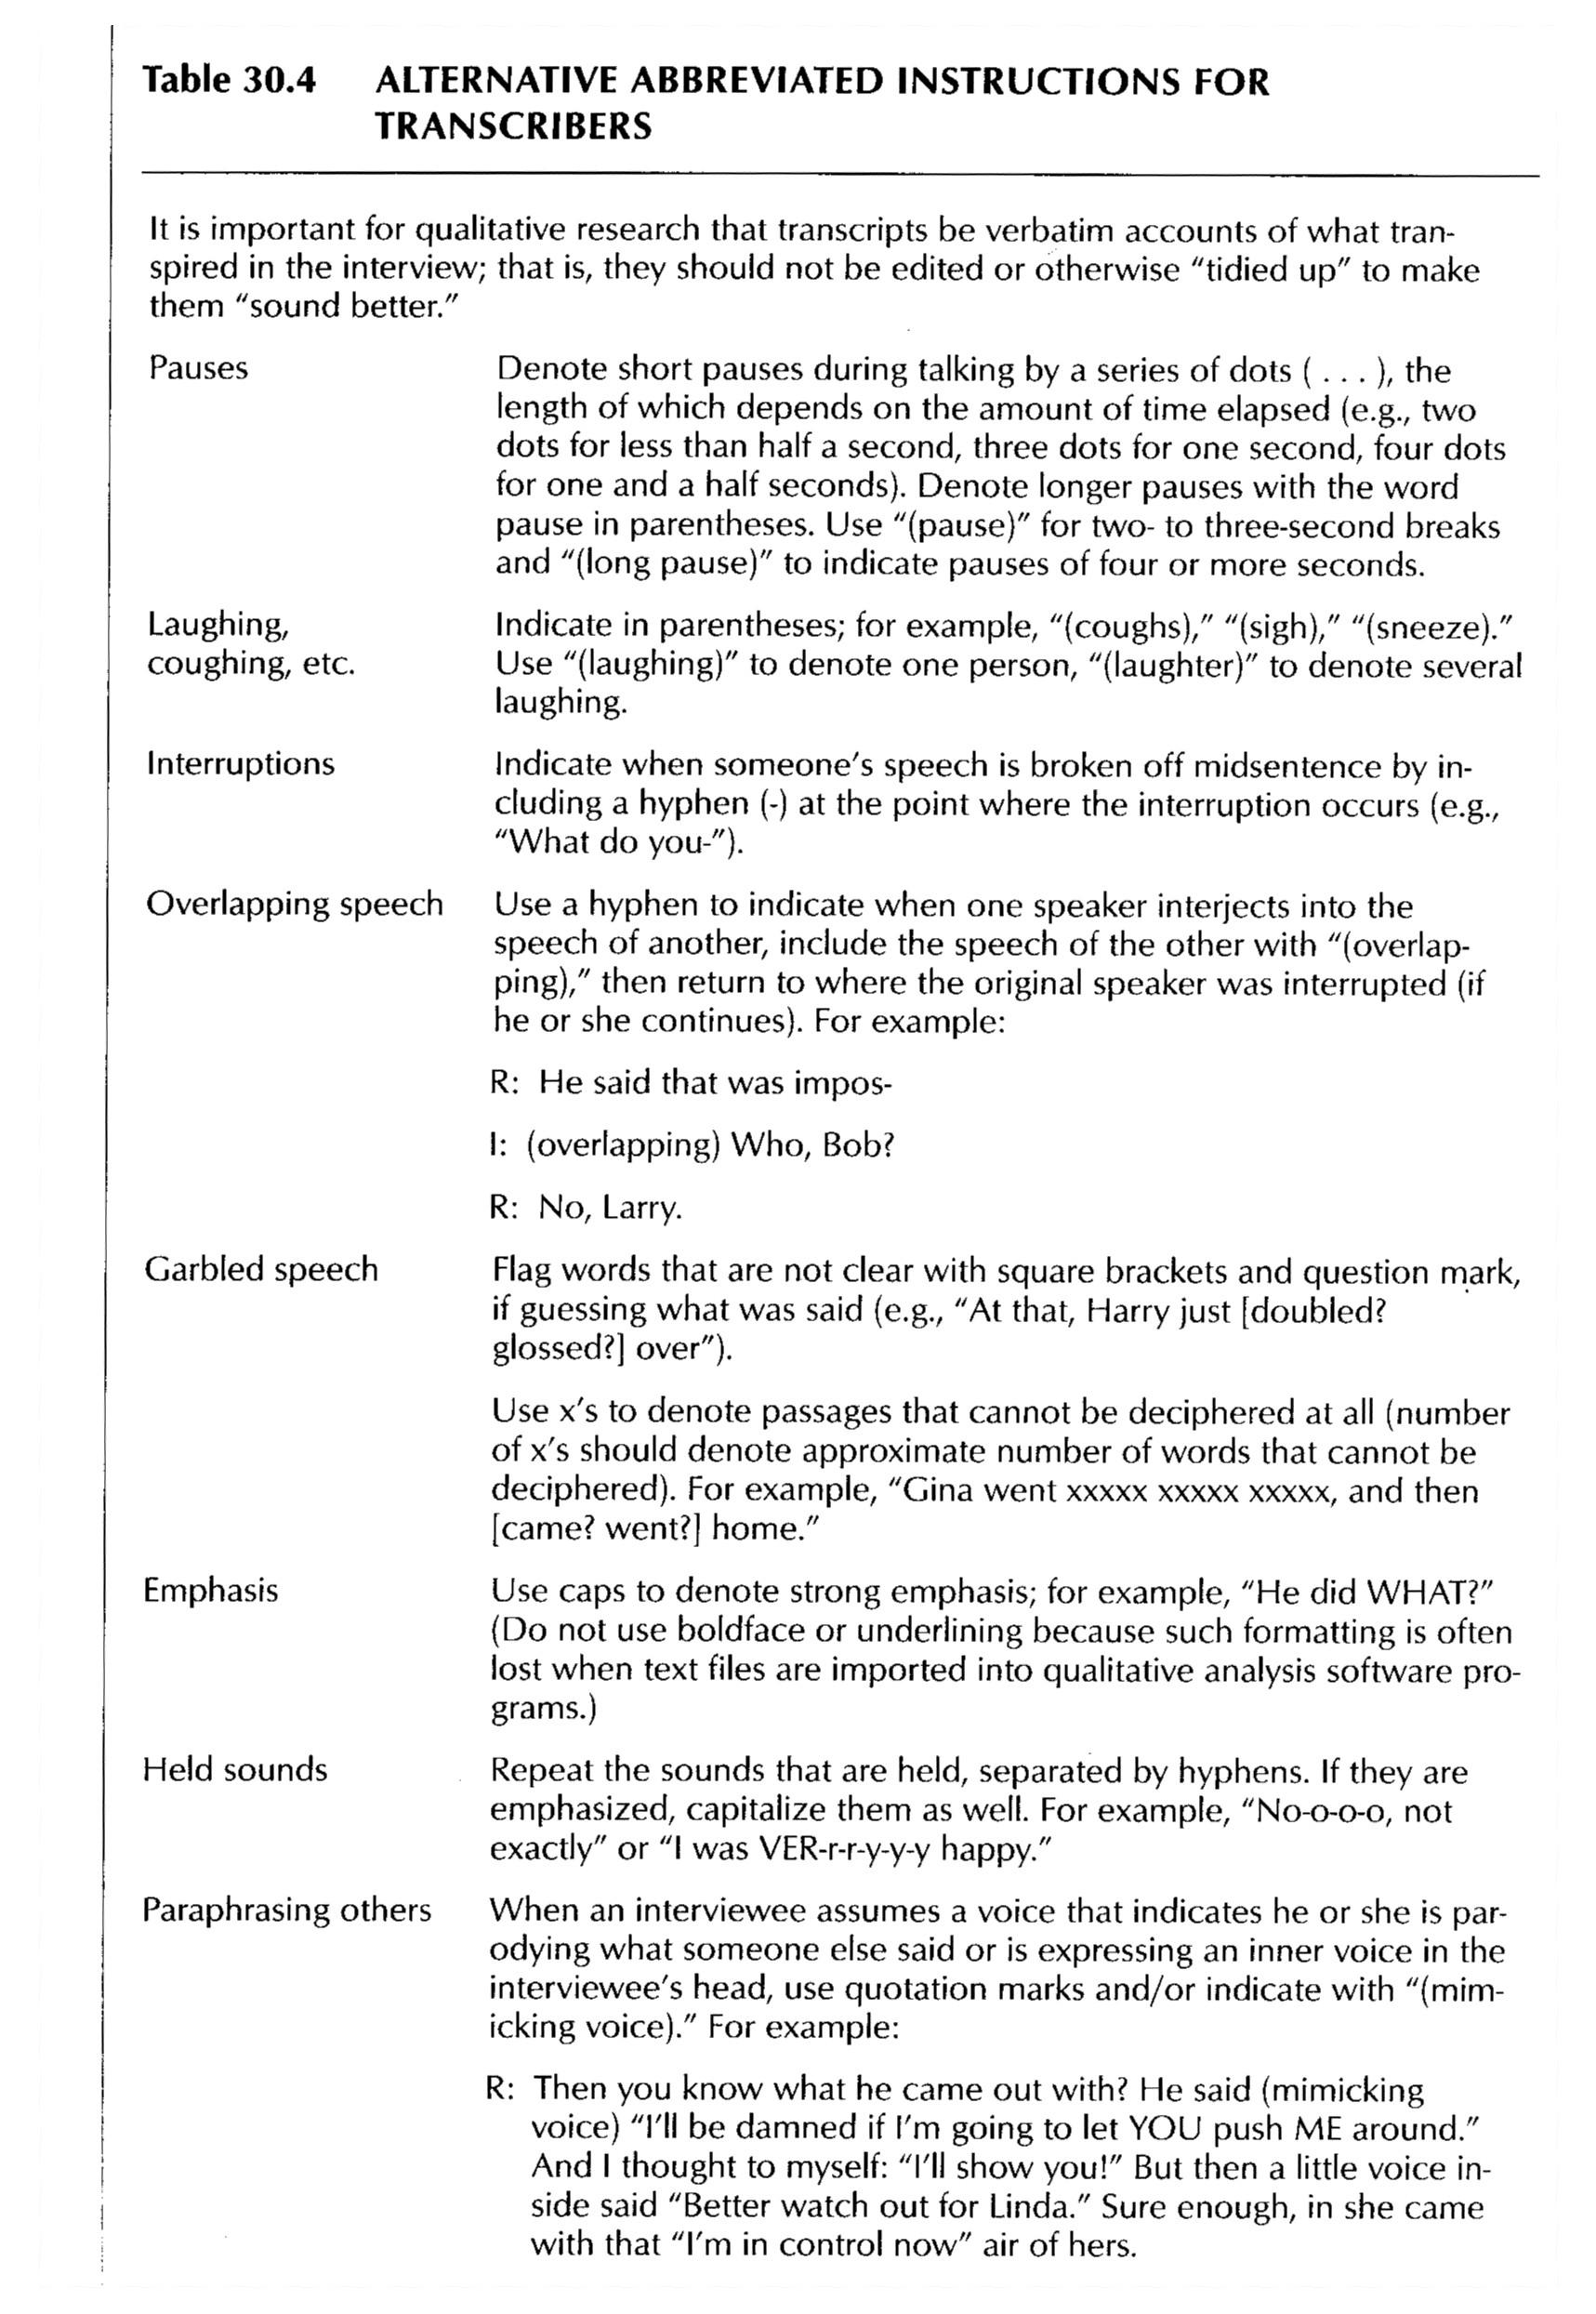 Case Study Method in Qualitative Research | blogger.com